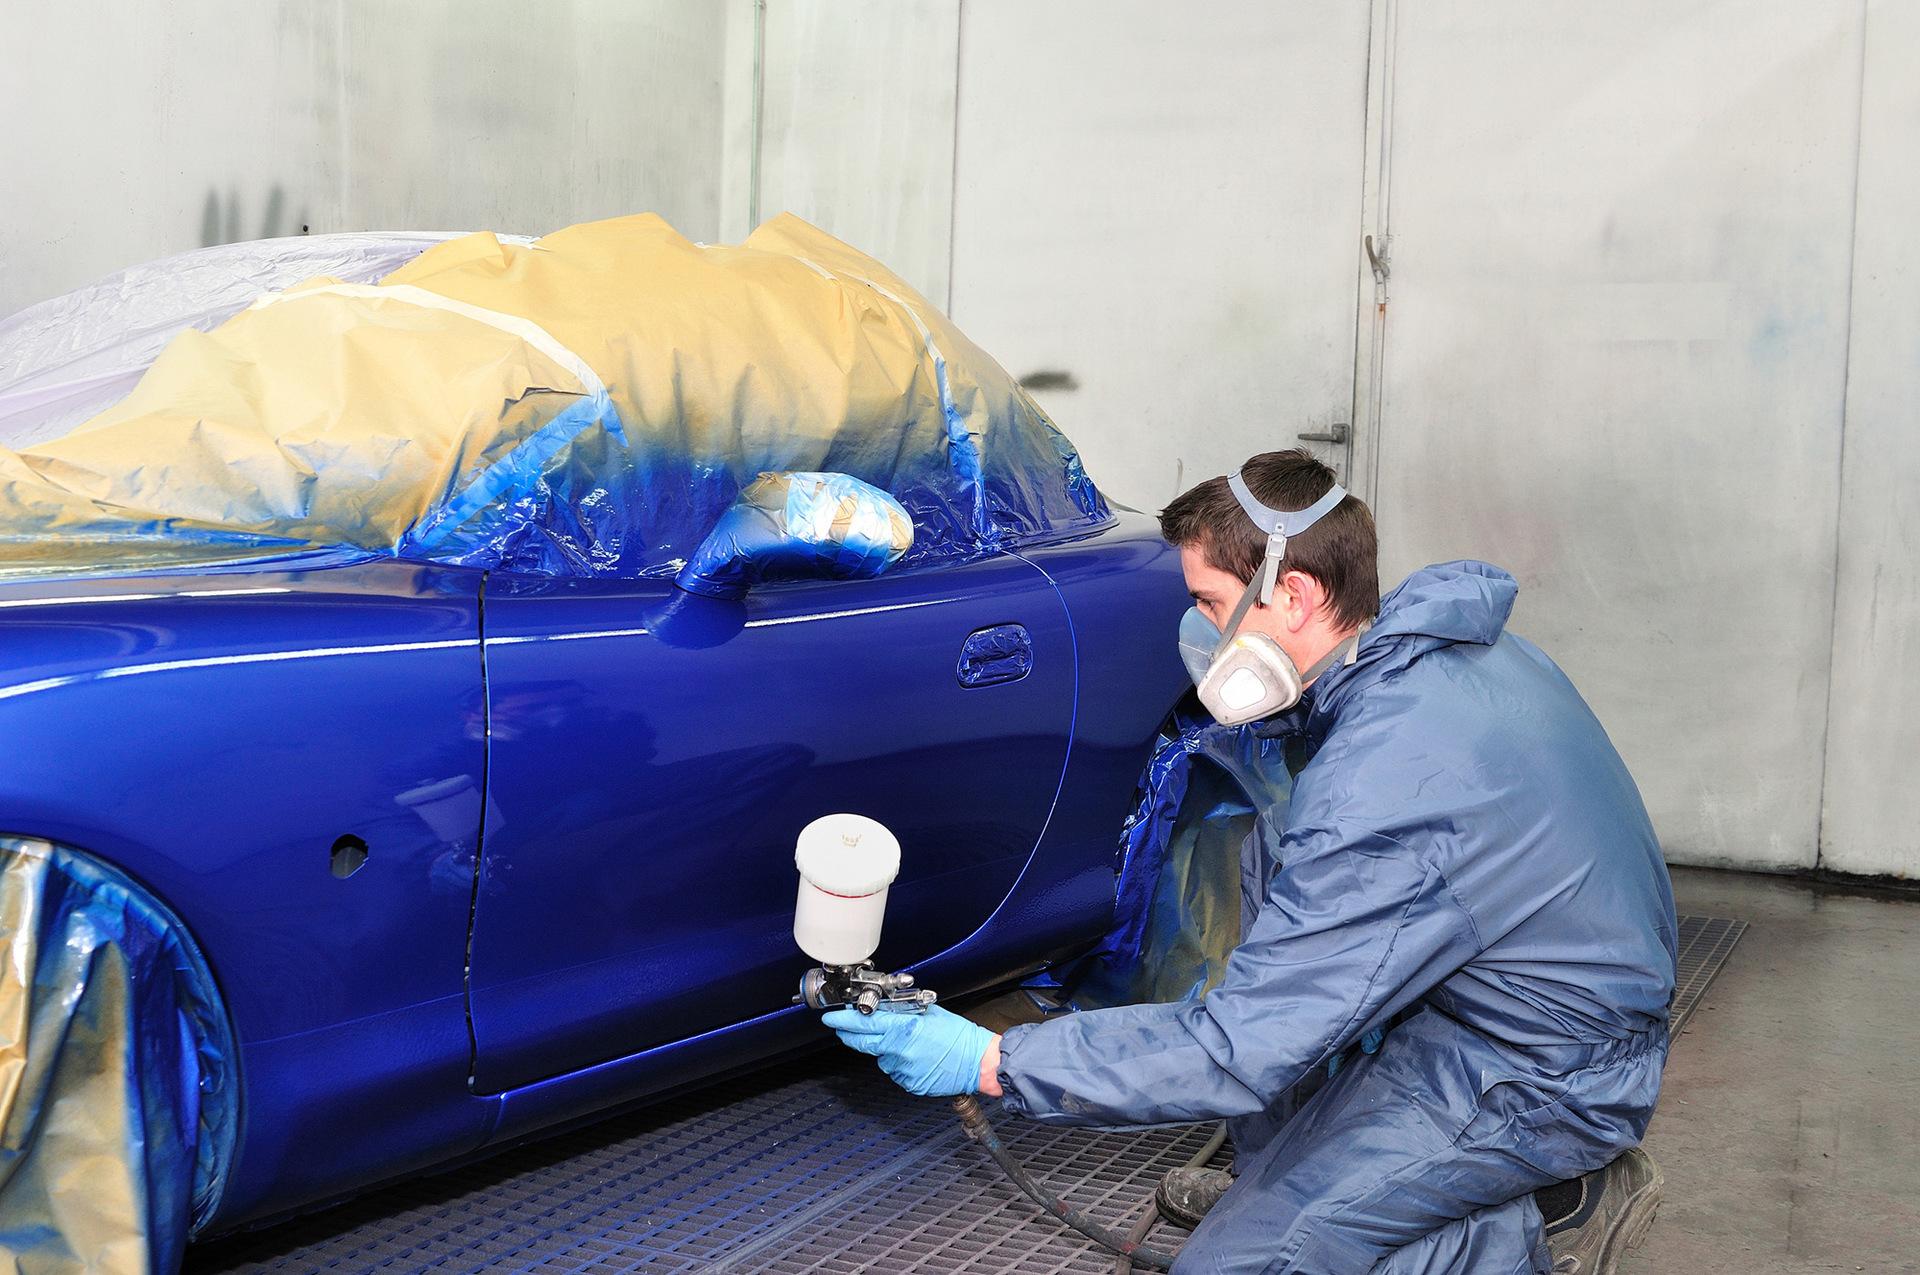 Paint Booth Rental >> Car painters Auckland, Car painters Manukau car respray